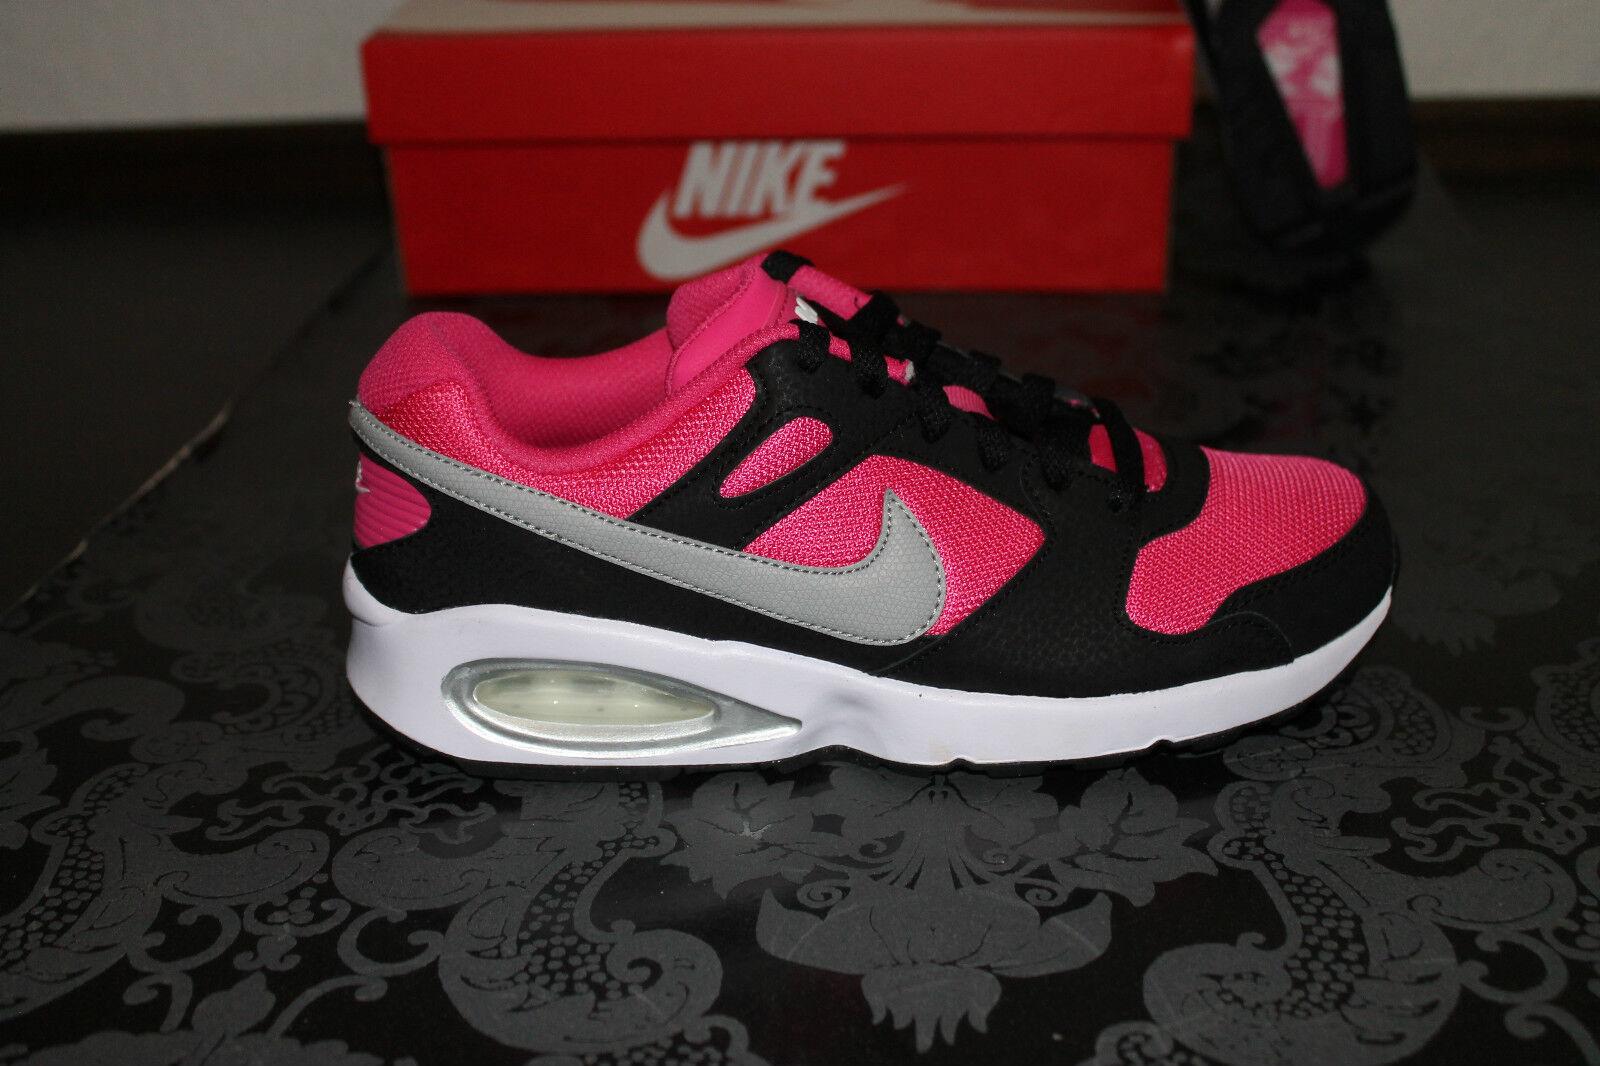 cheap for discount 403fe a387b ... Nike Air Max Coliseum señora running running running zapatos negro rosa  tamaño 38 o 38, ...